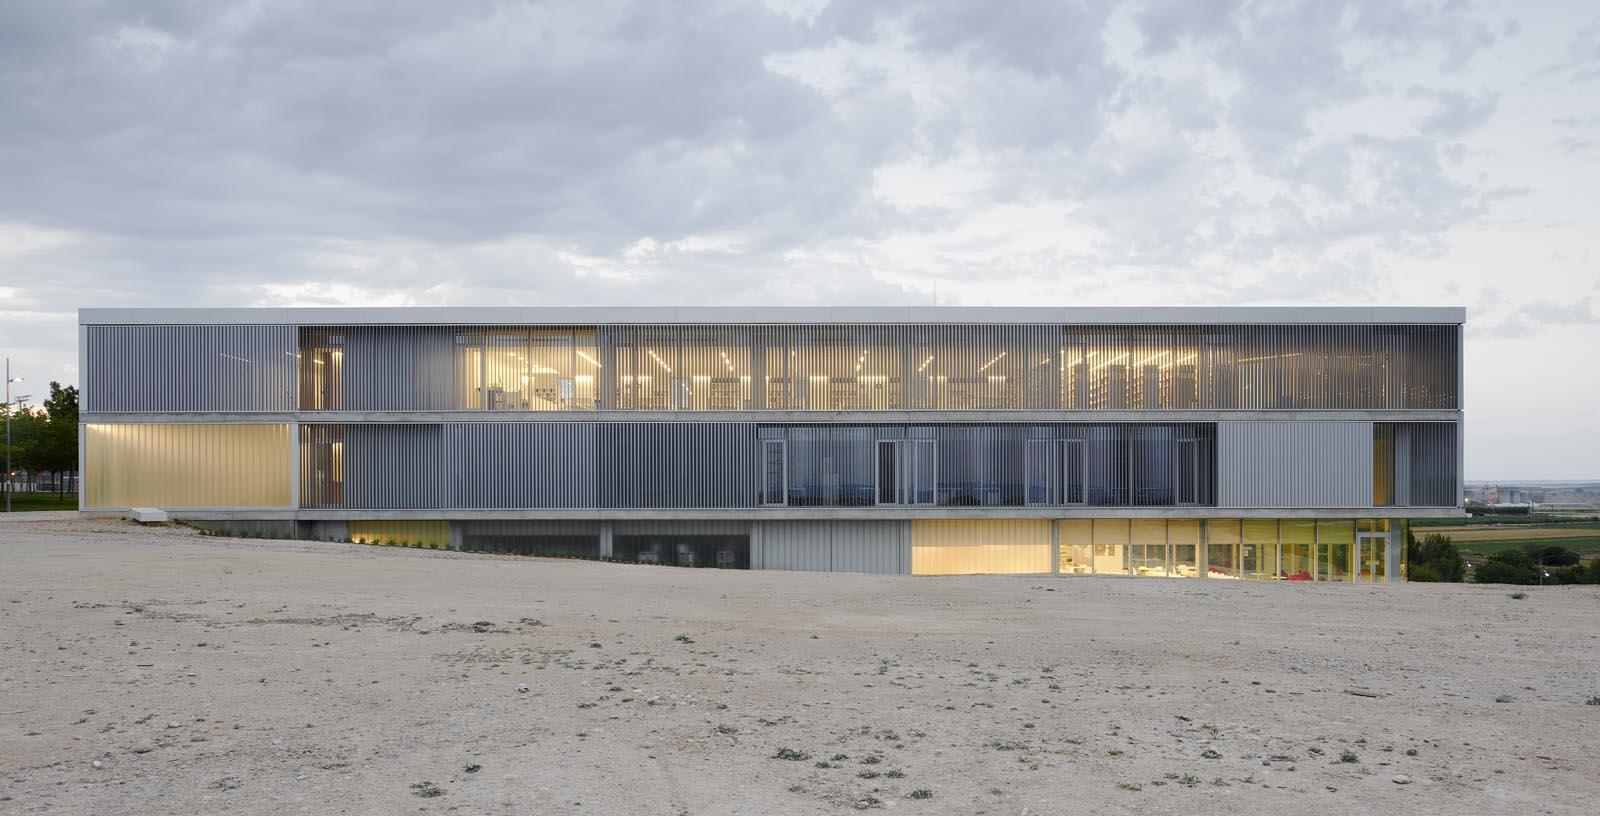 Building-San_Jorge_University_15-Architecture-IDOM-copyright-Inaki_Bergera